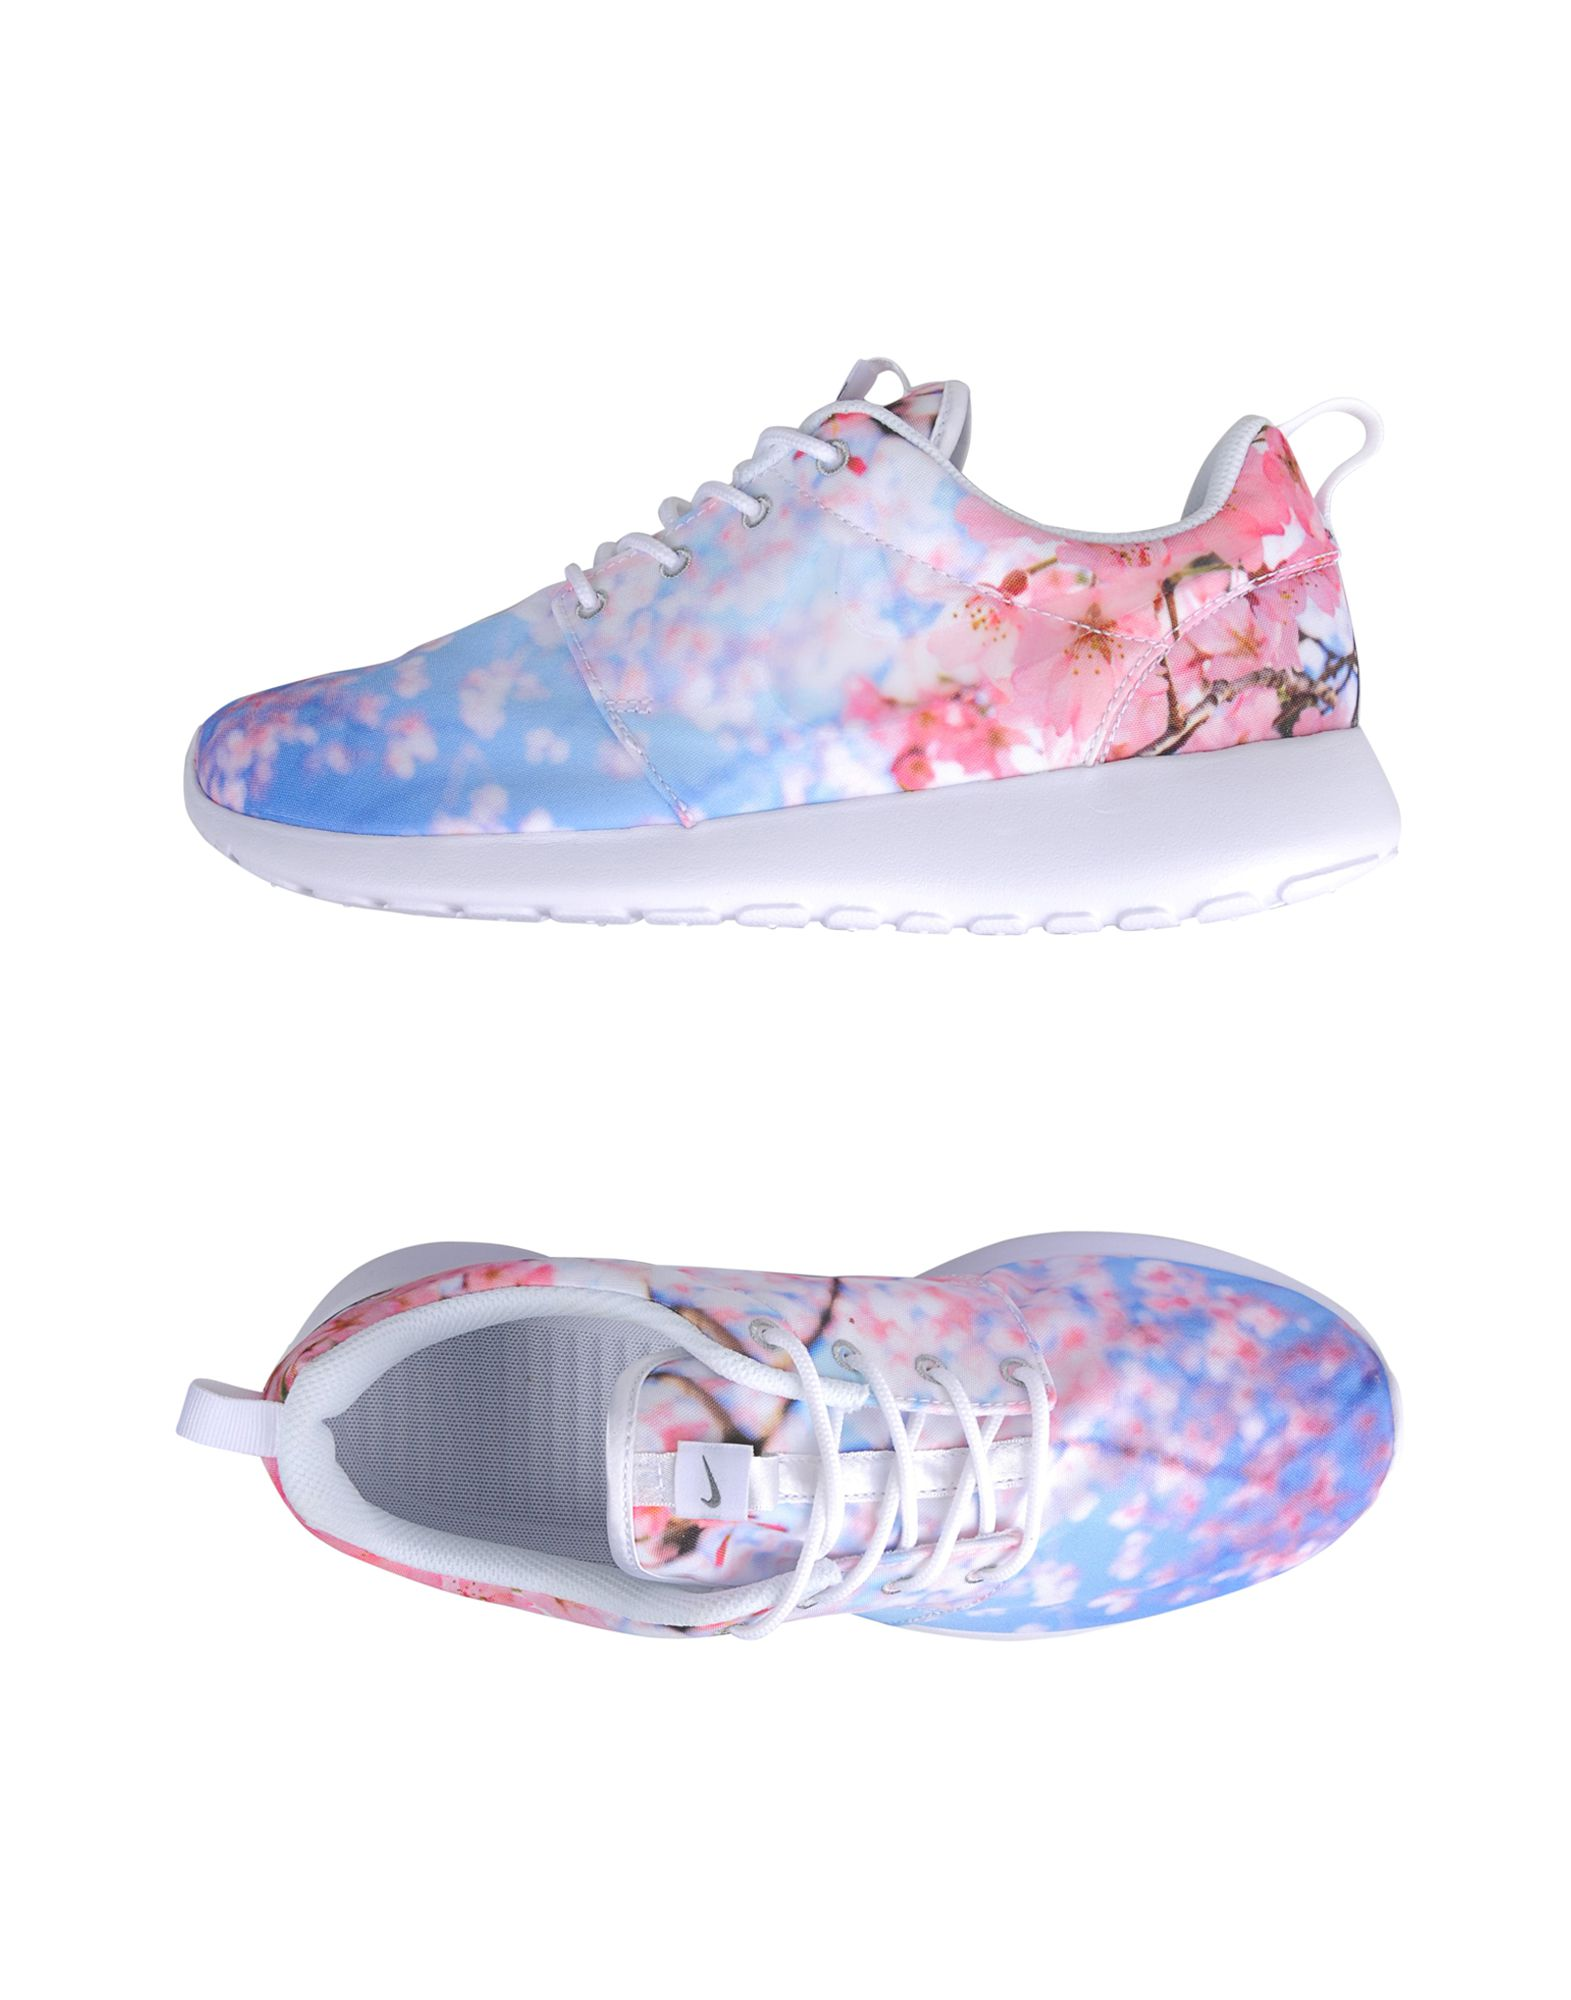 Nike Wmns Nike Roshe One Cherry Bls  11024464AH Gute Qualität beliebte Schuhe